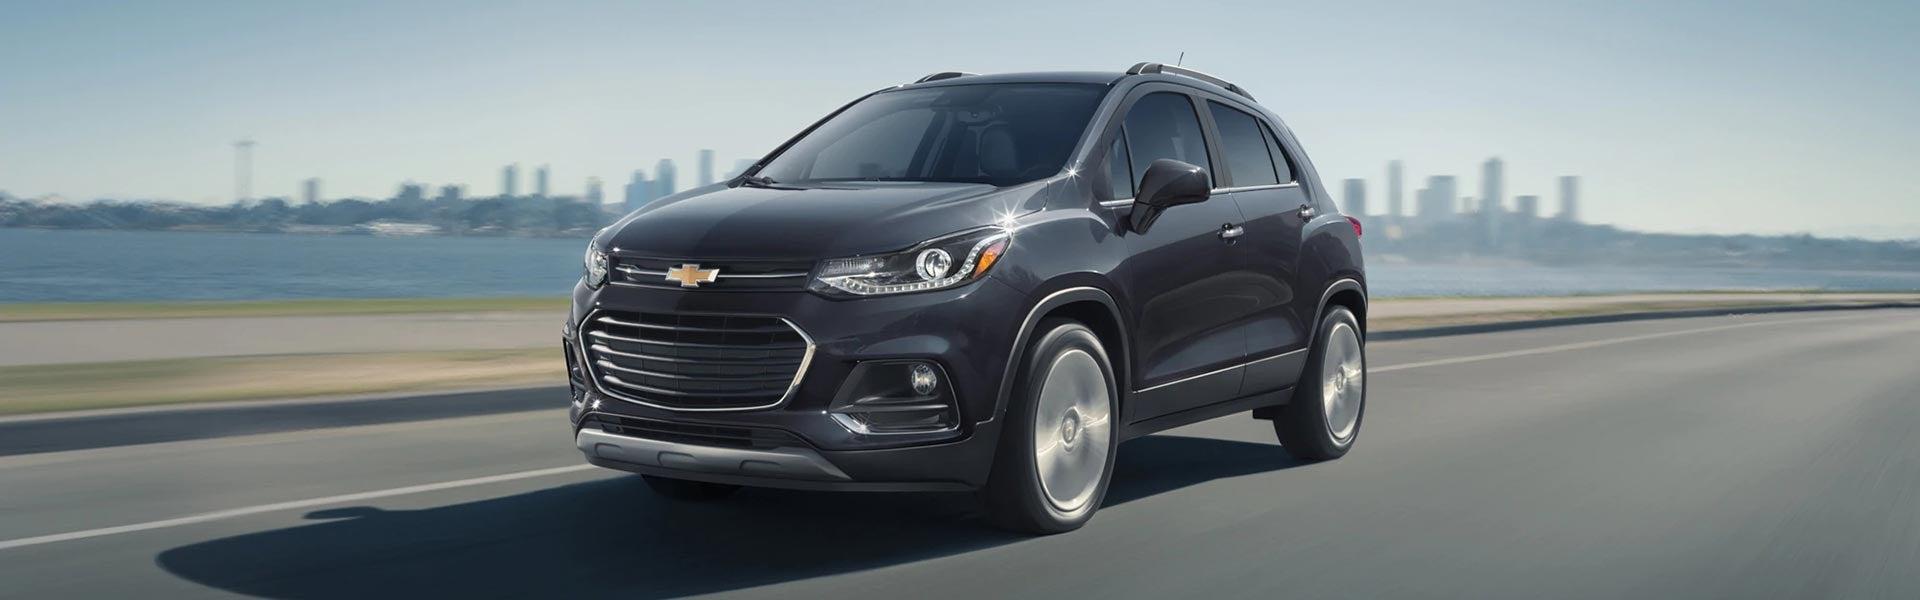 Get Pre Approved Chevrolet Dealership In Fairfax Va Jim Mckay Chevrolet